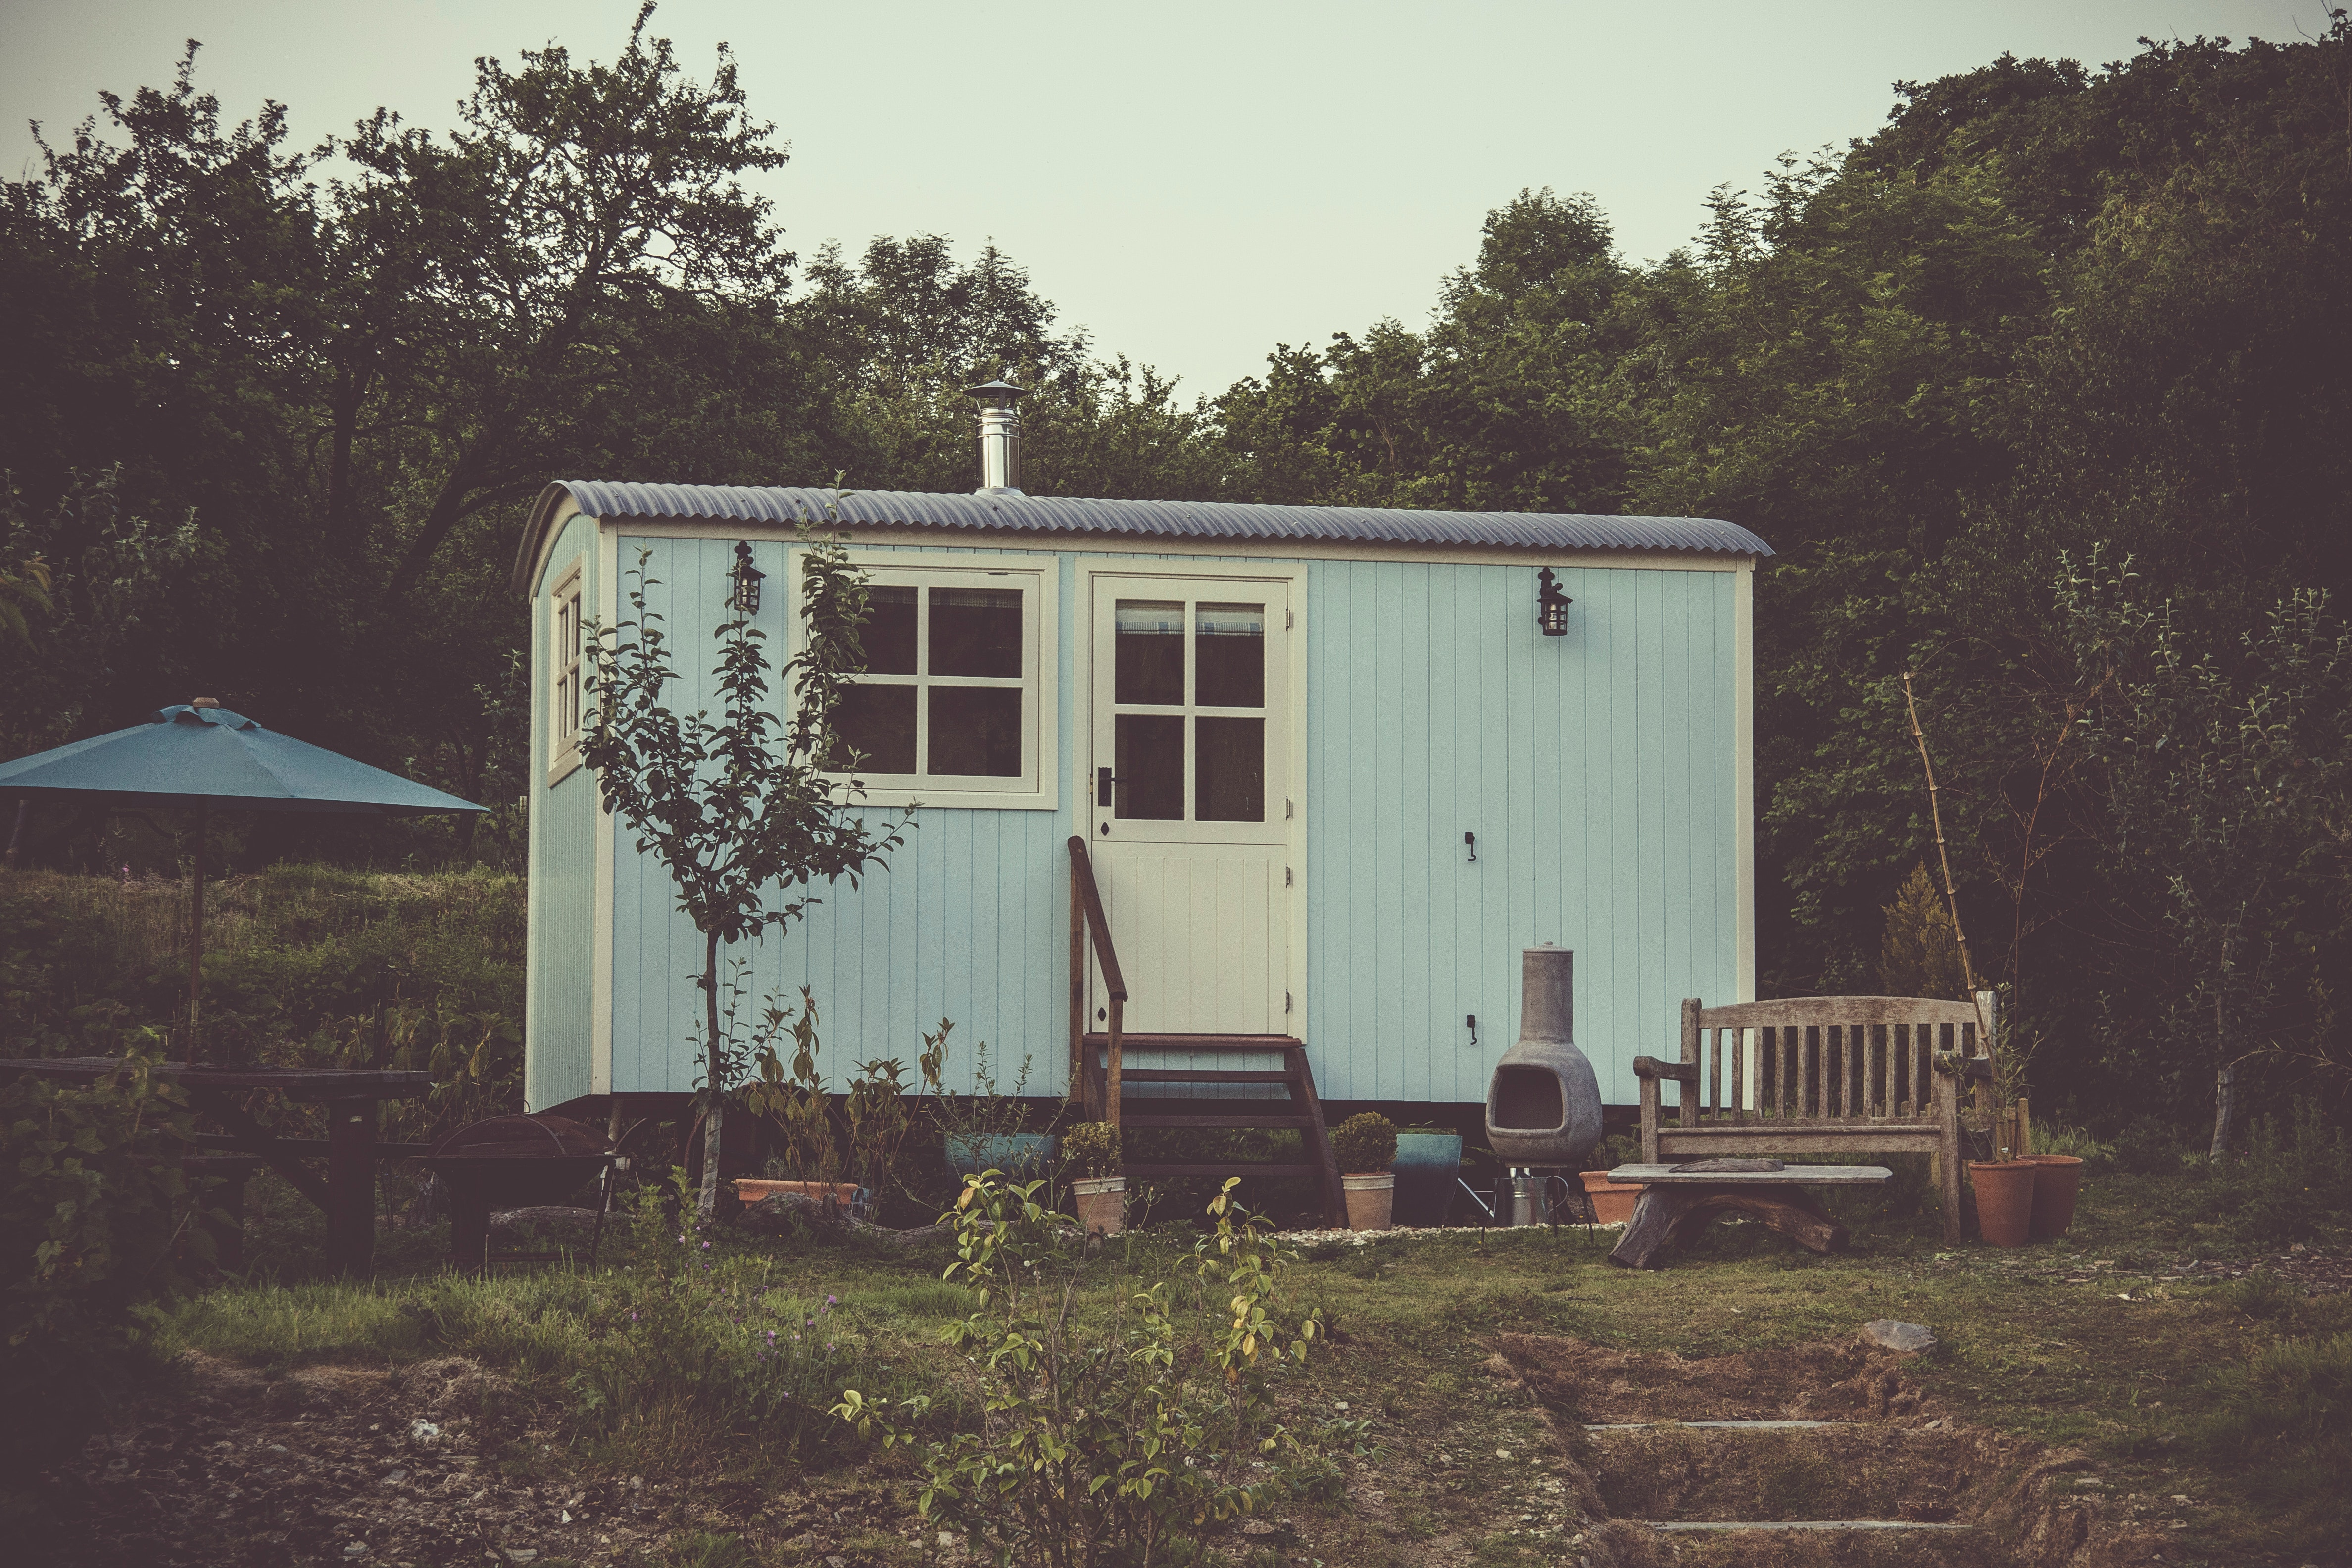 1000+ Kleines Haus Fotos · Pexels · Kostenlose Stock Fotos